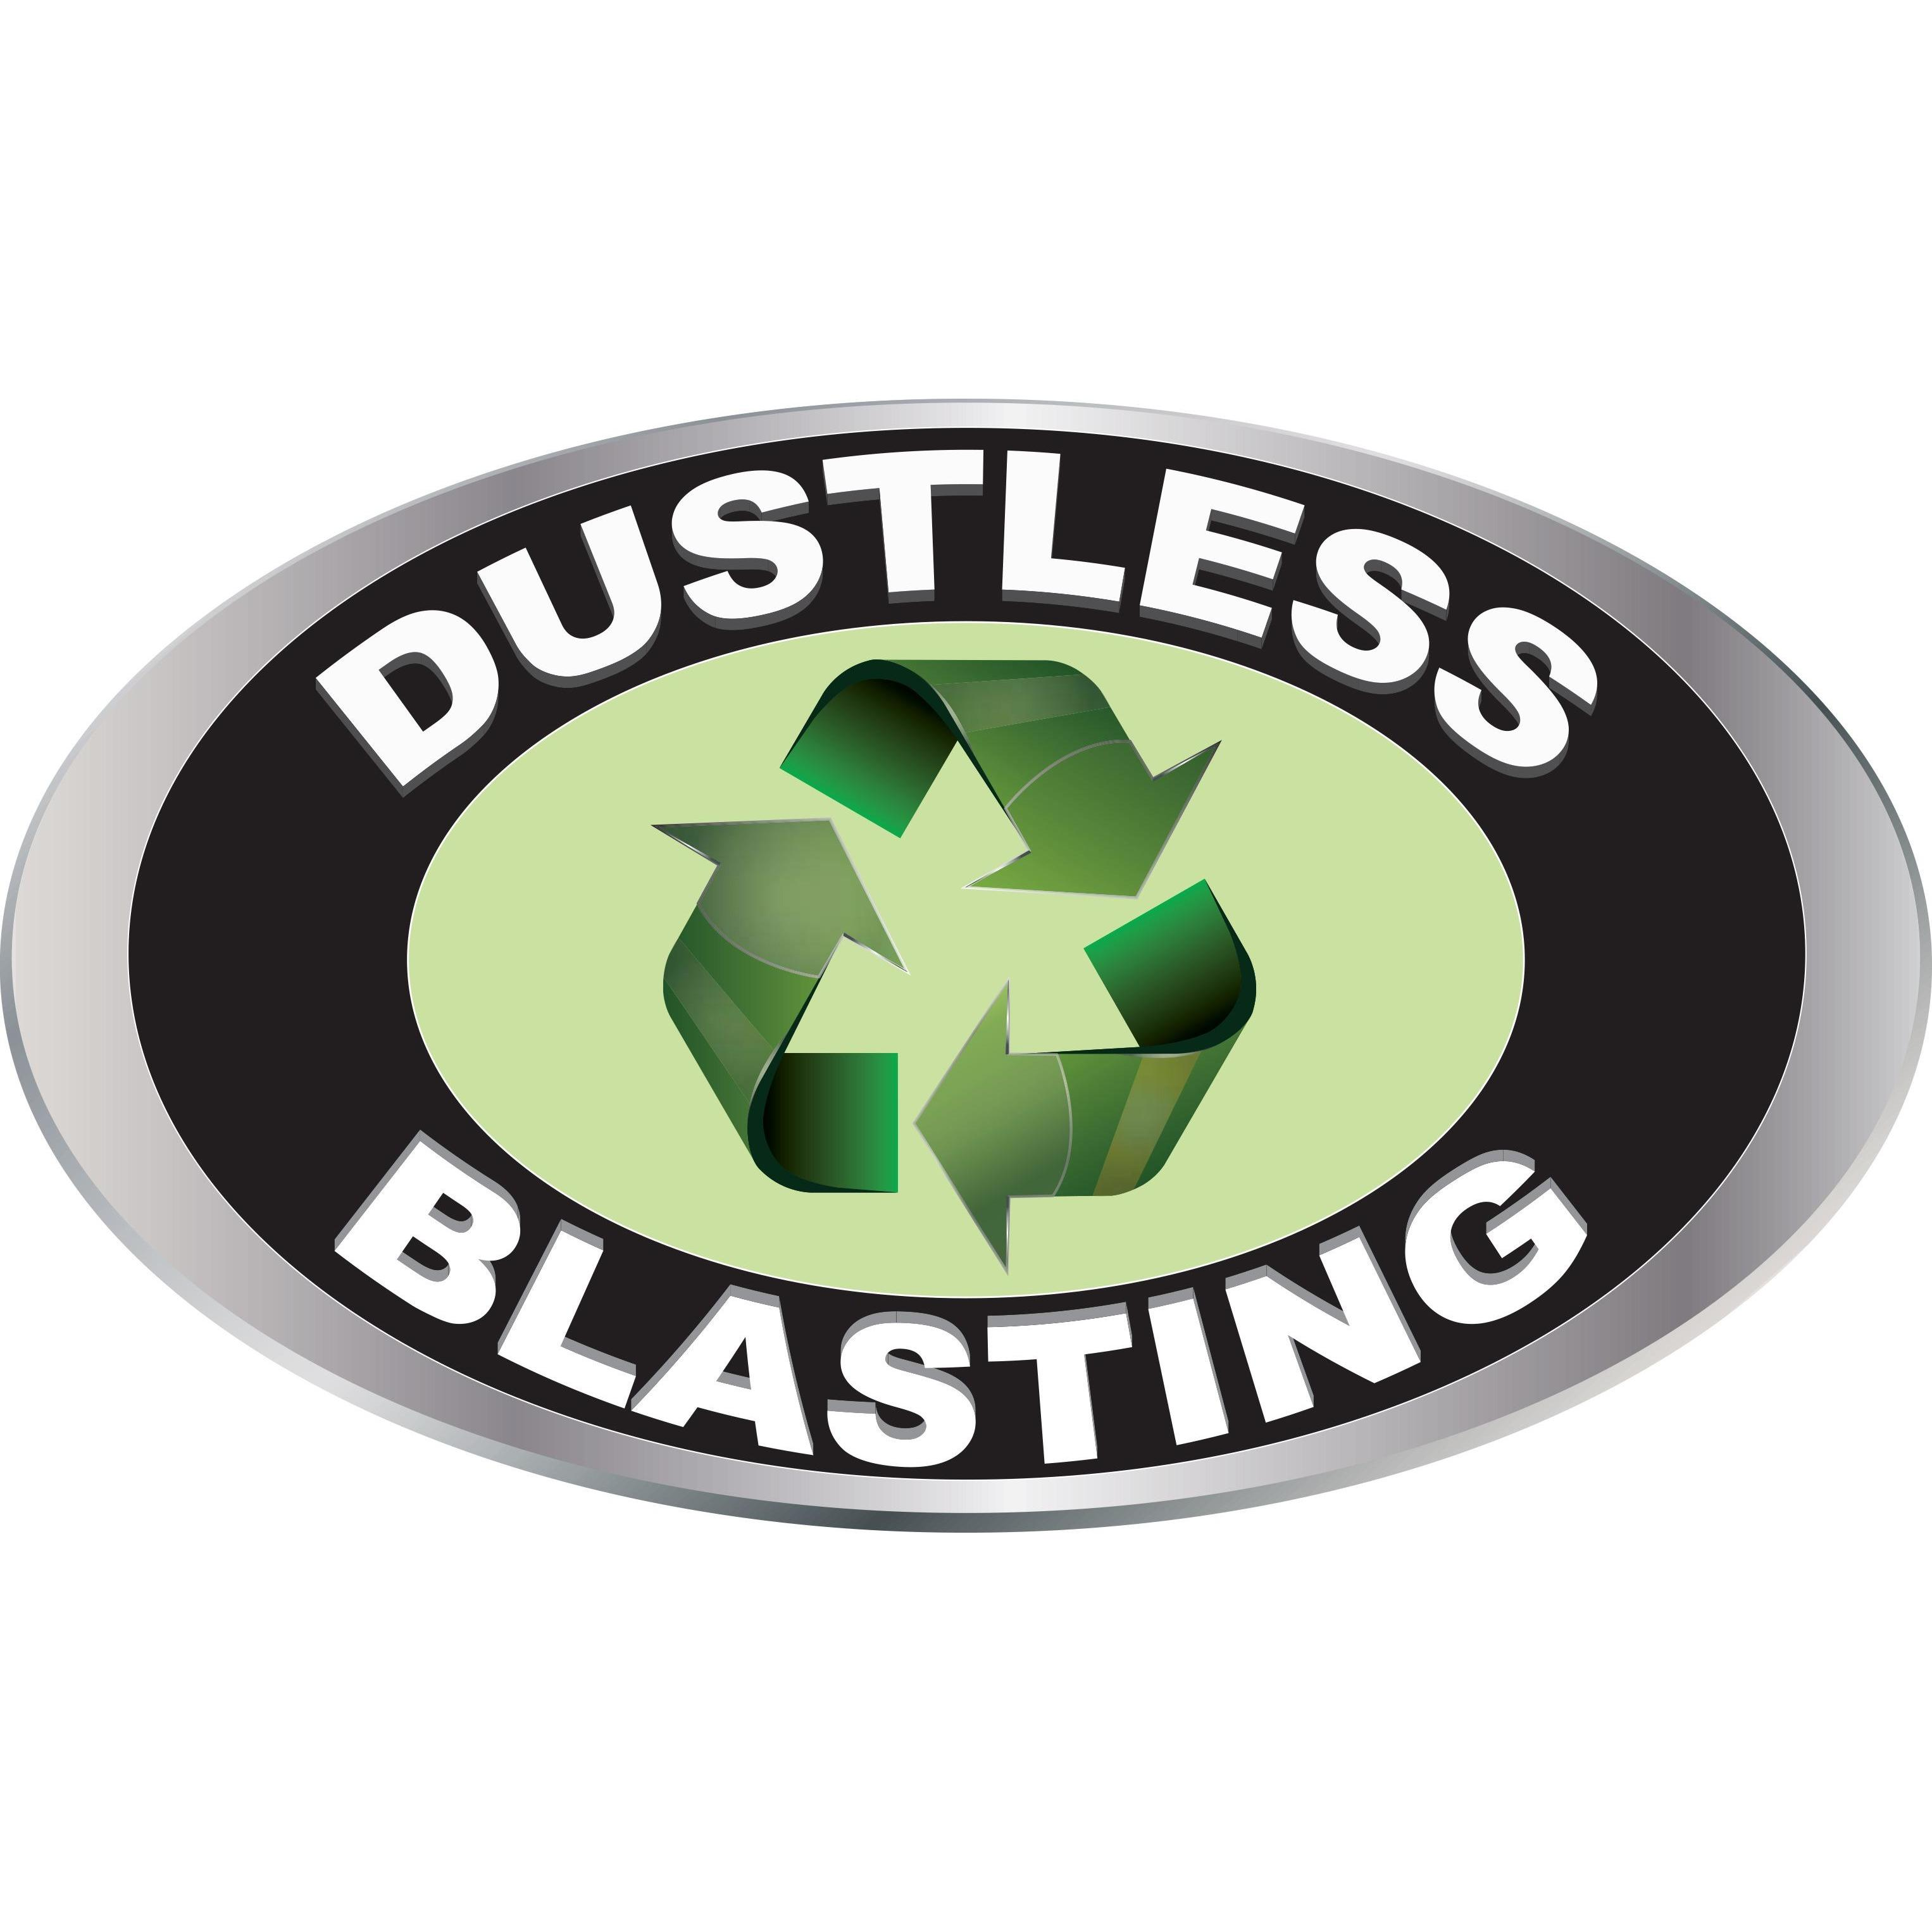 J&M Dustless Blasting, Inc